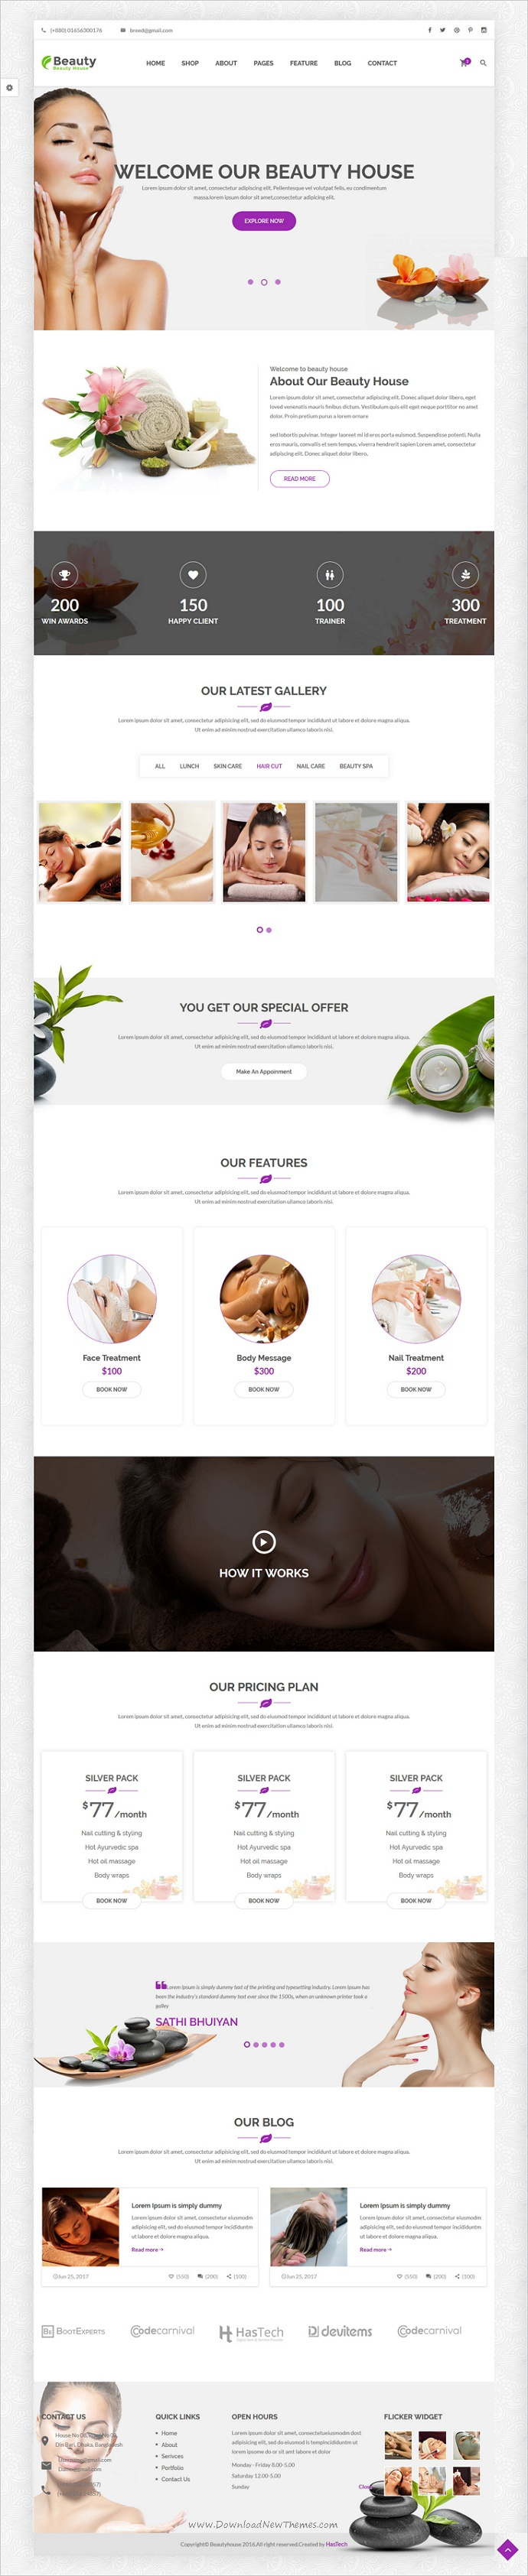 Beautyhouse - Health & Beauty HTML Template | Template, Web design ...